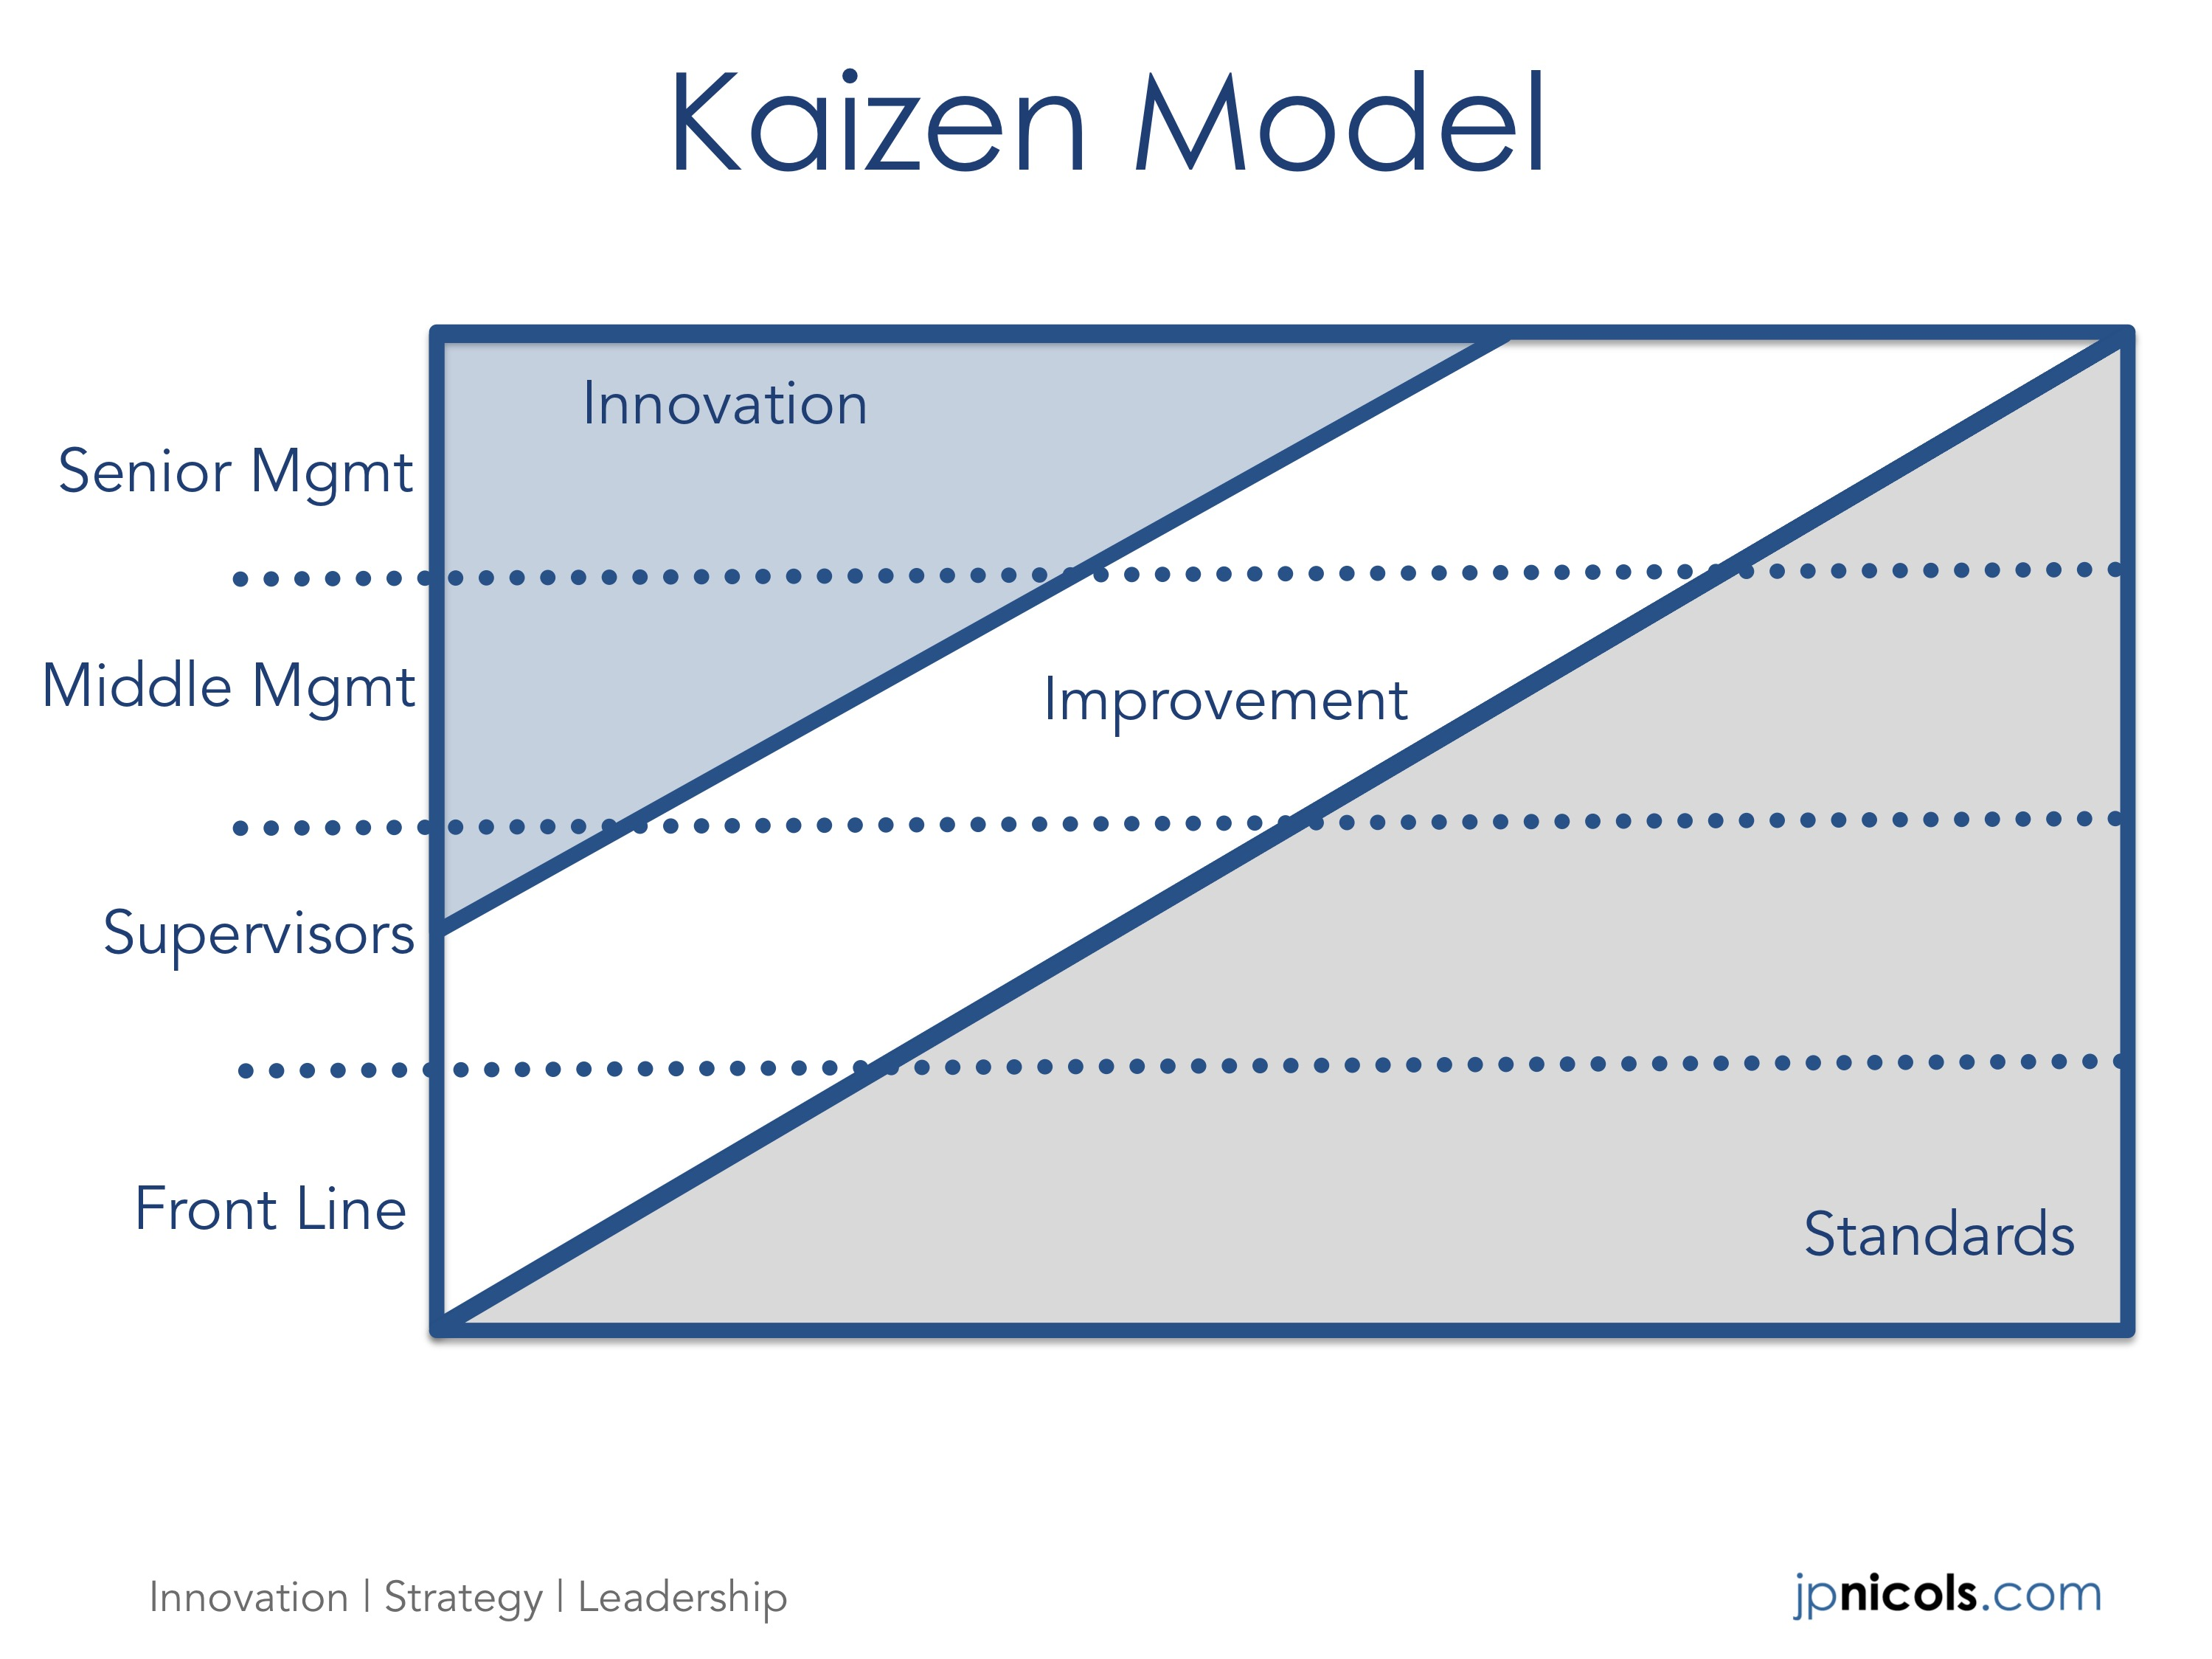 Kaizen Model